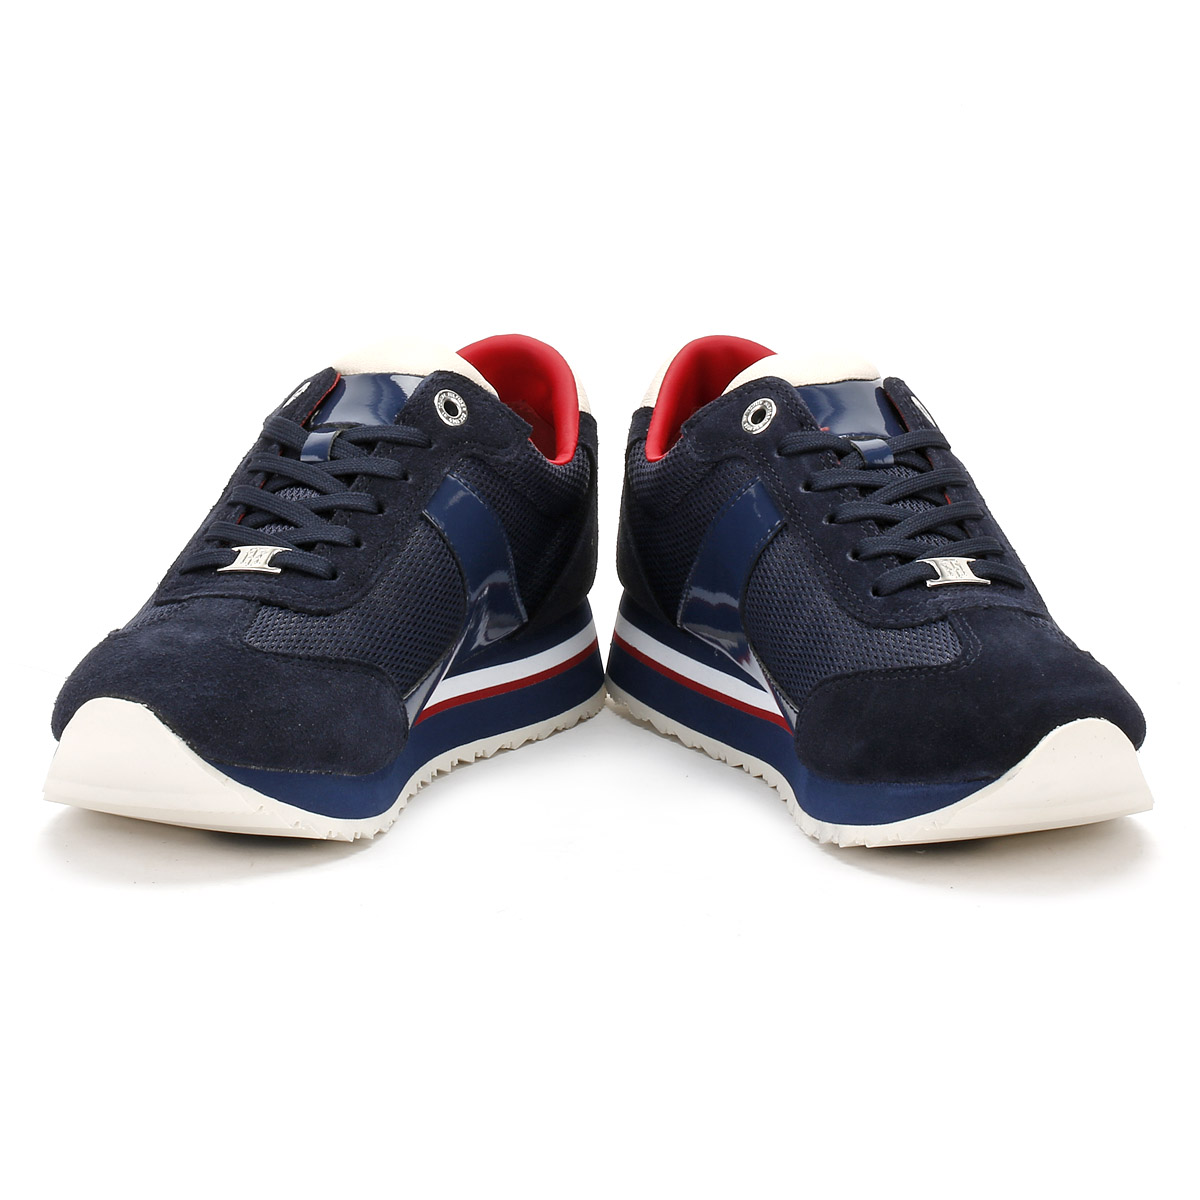 Tommy Hilfiger damen Trainers, Navy Blau, 1C1 Runner, Runner, Runner, Leather, Sport schuhe    Sale Online  72173a